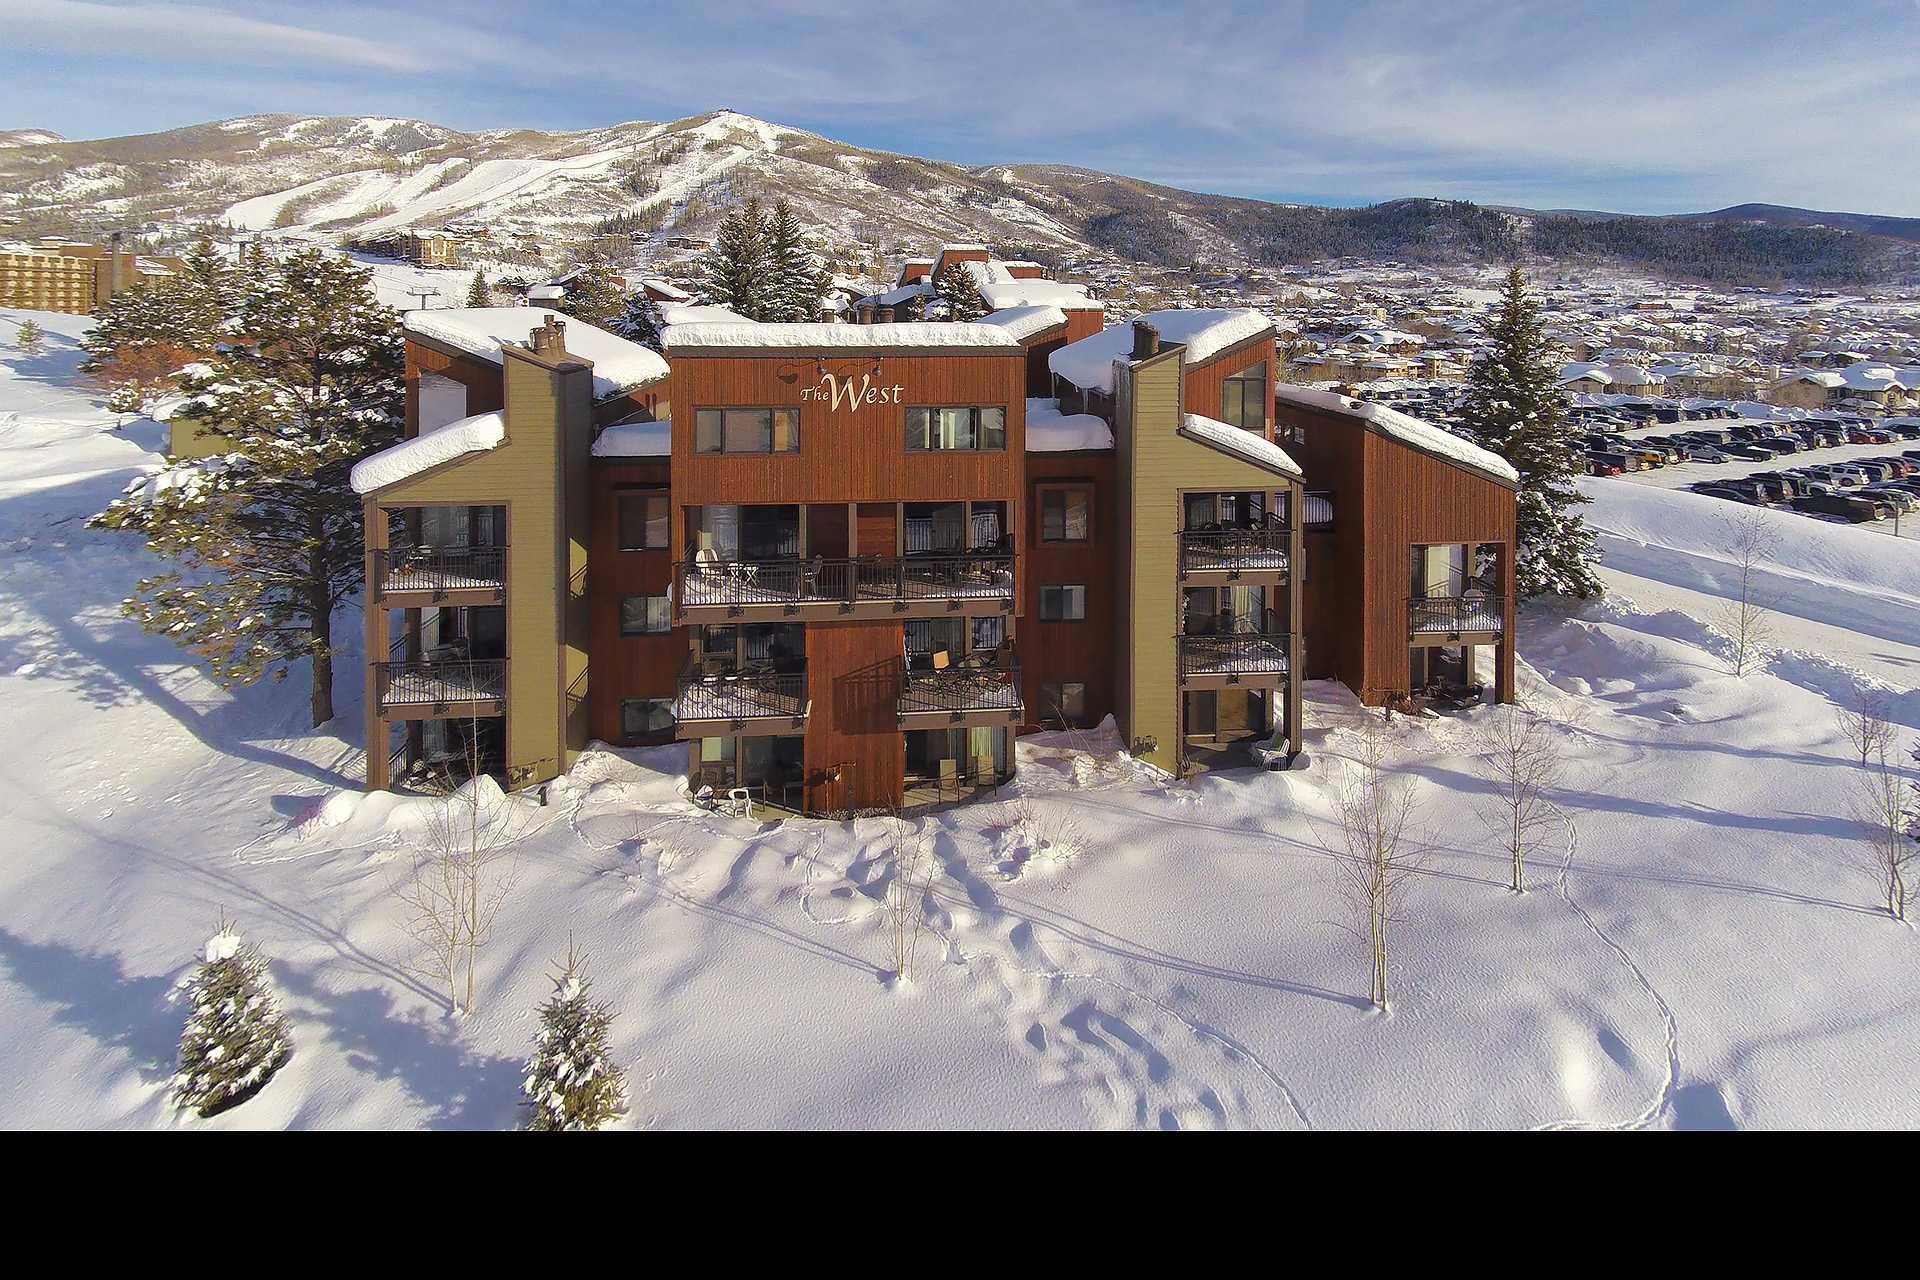 W3537: The West Condominiums